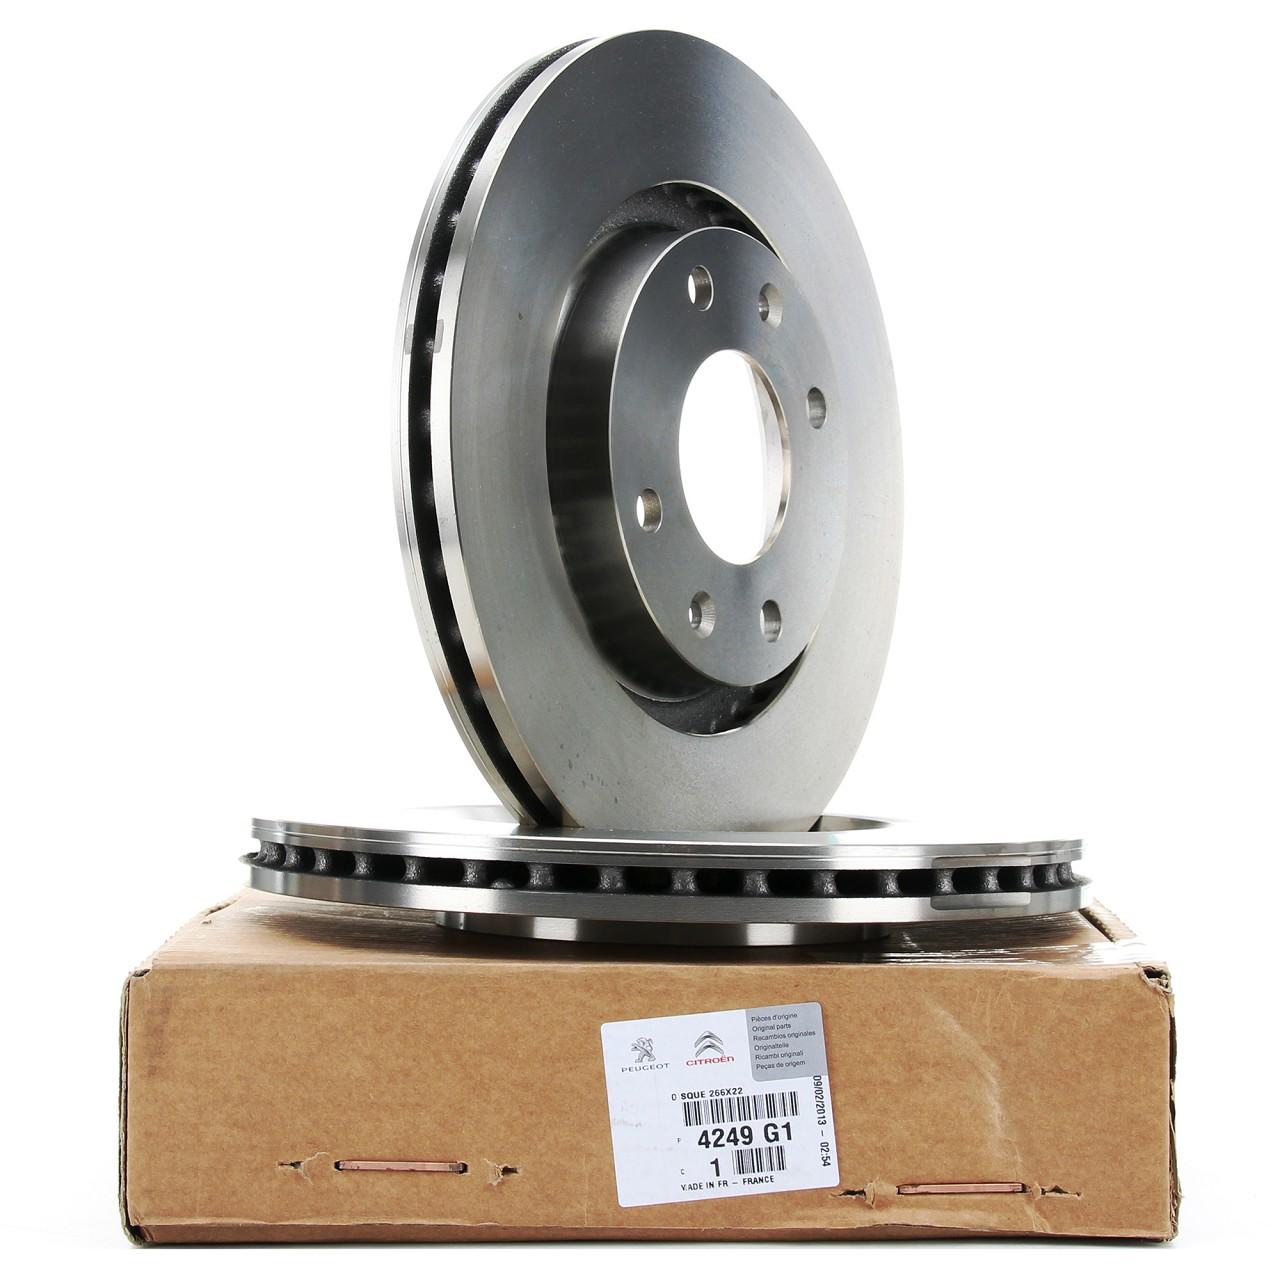 ORIGINAL Citroen Peugeot Bremsscheiben Satz C2 C3 C4 DS3 206 207 208 301 vorne